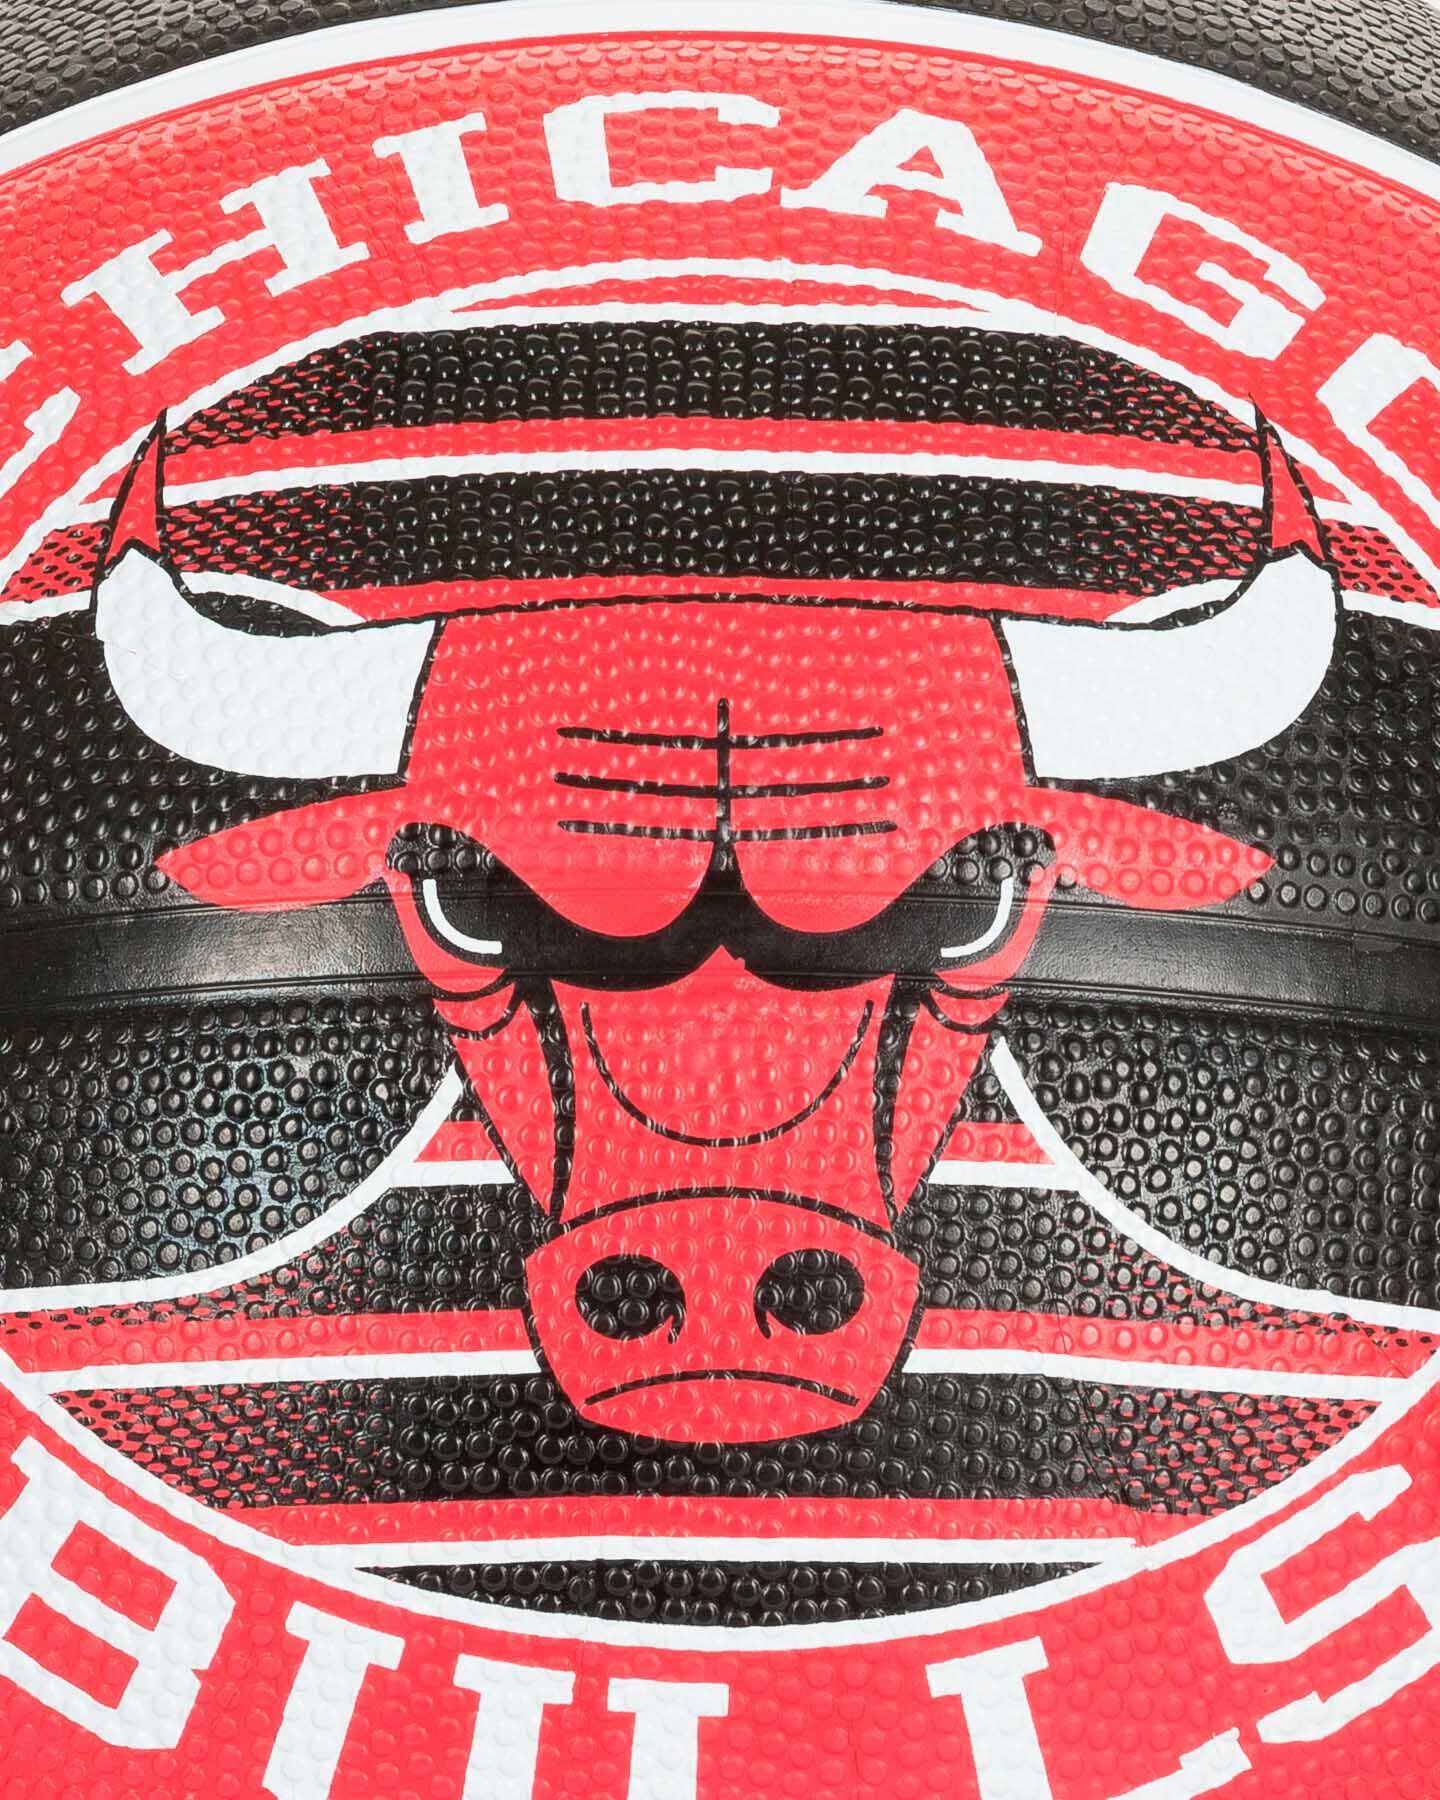 Pallone basket SPALDING BULLS NBA TEAM SZ.7 S2006545 UNI UNI scatto 2